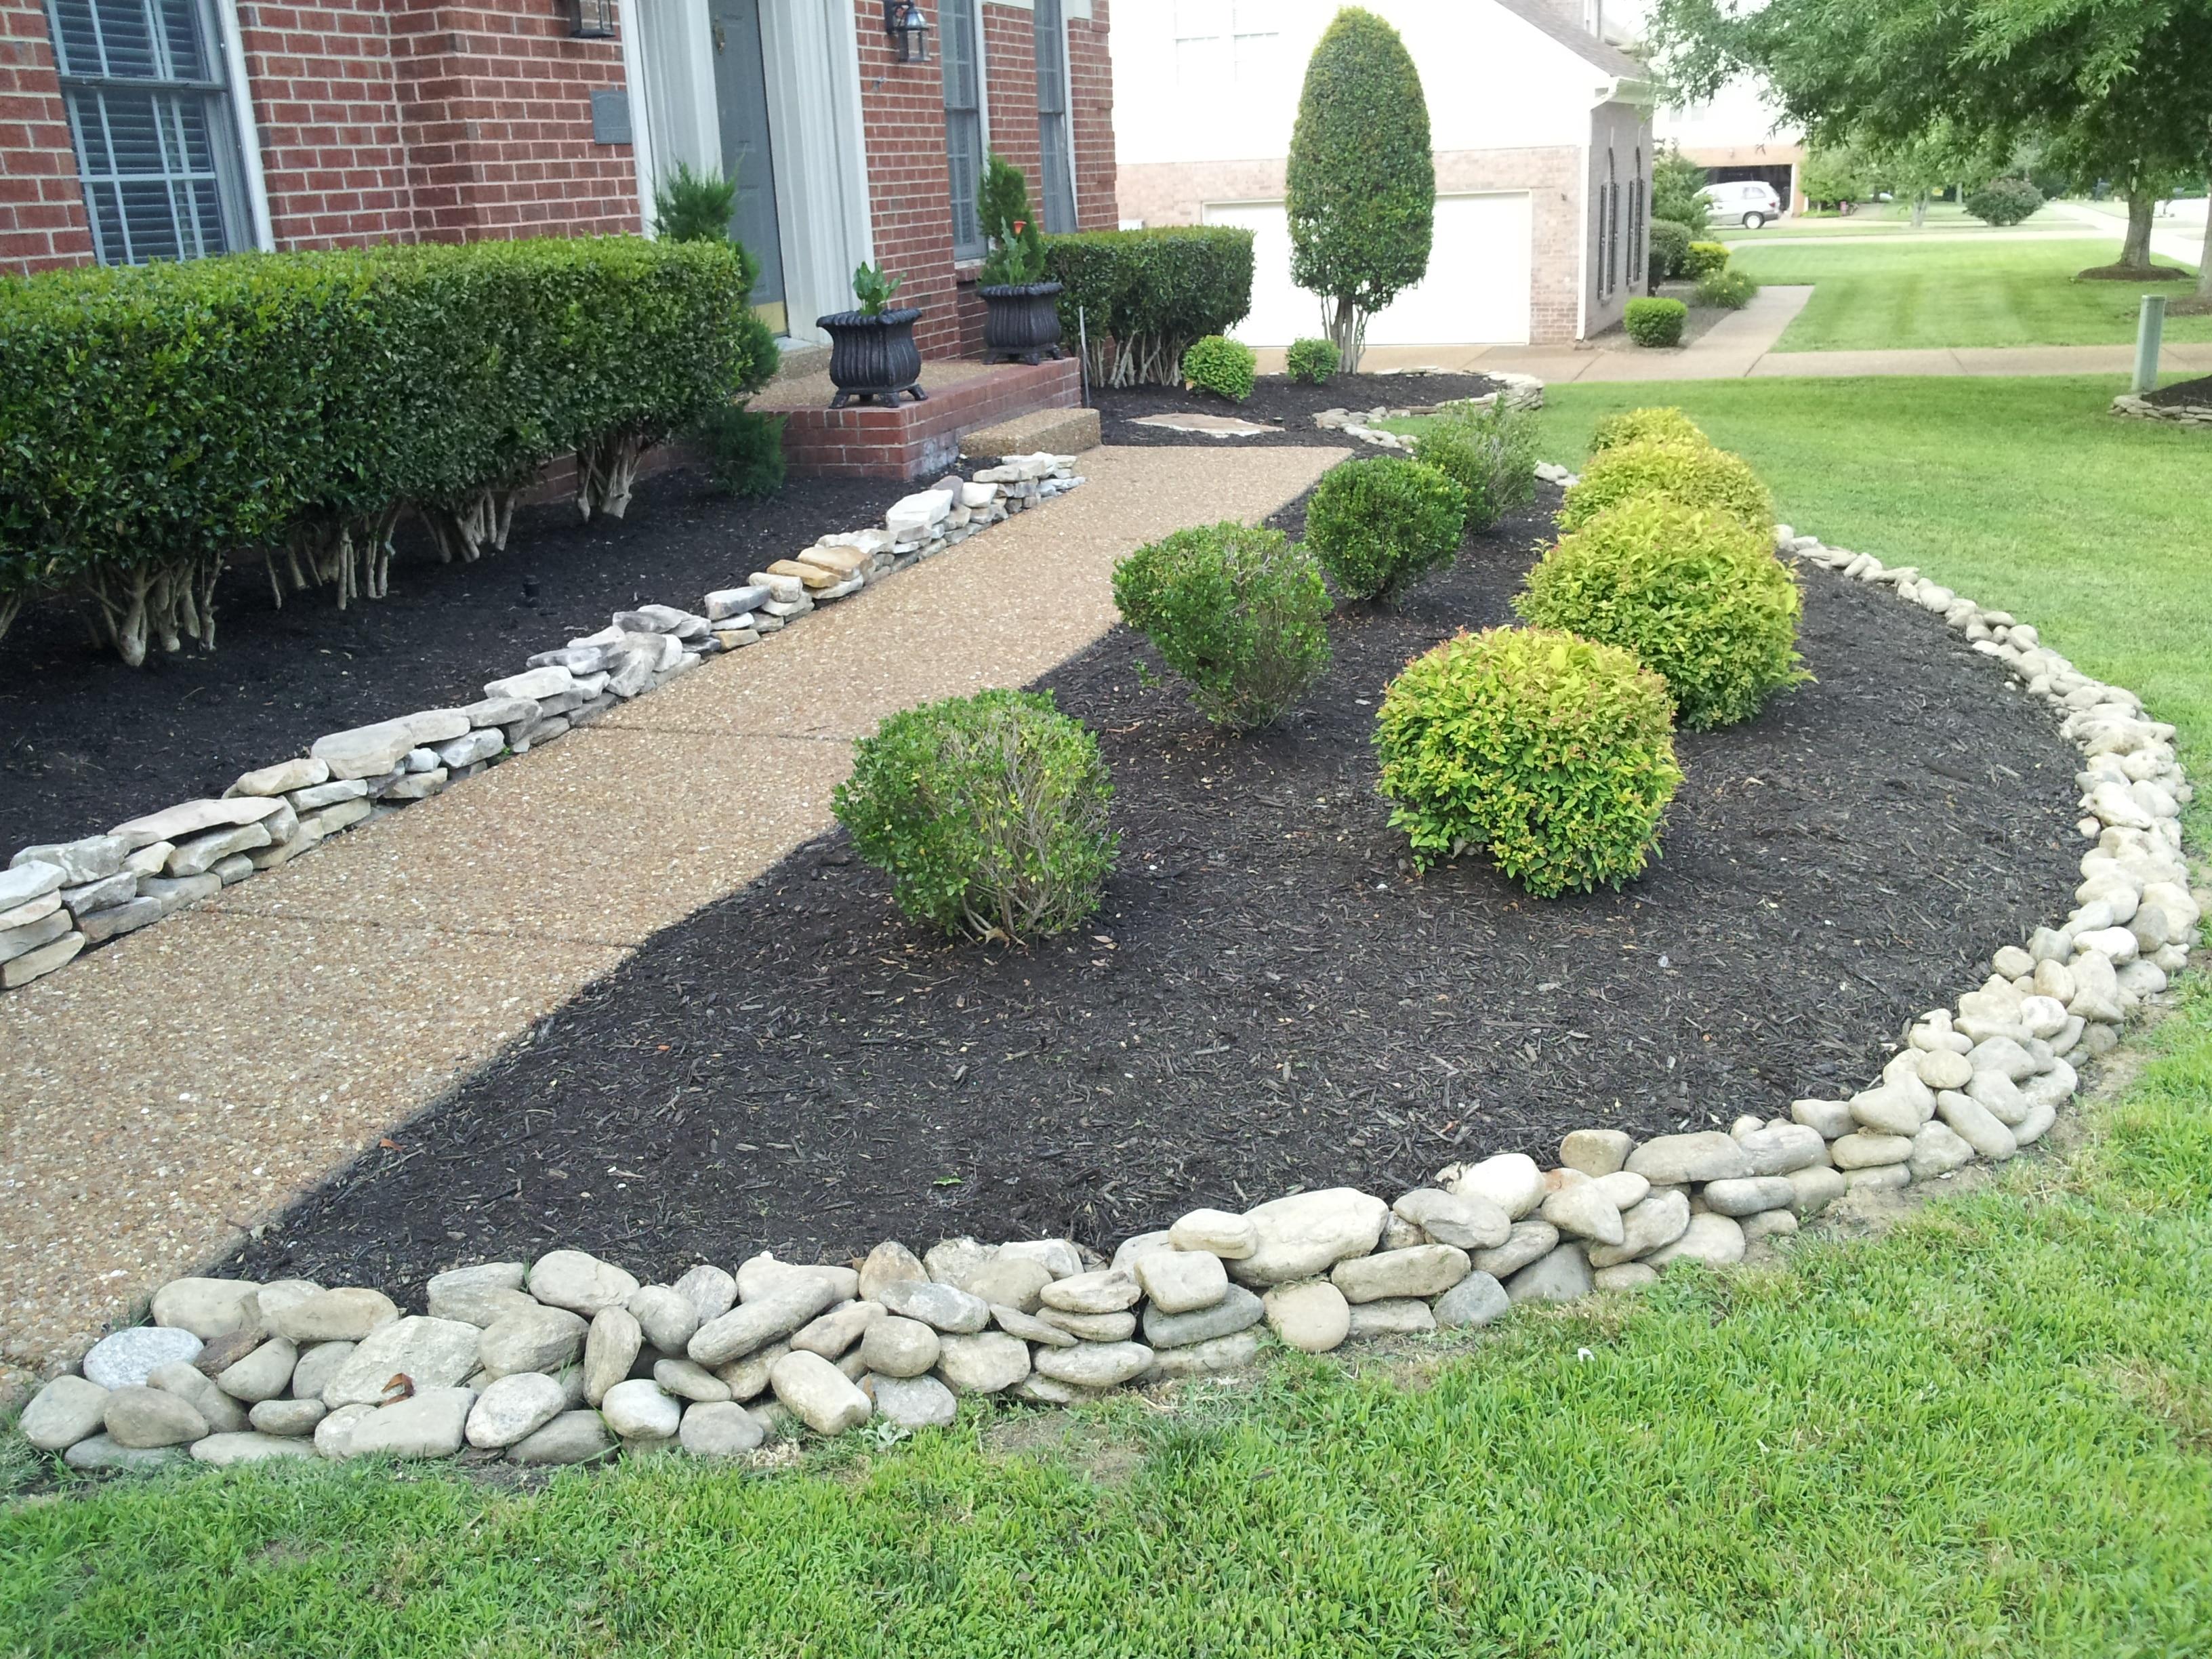 Landscaping Brick Idea